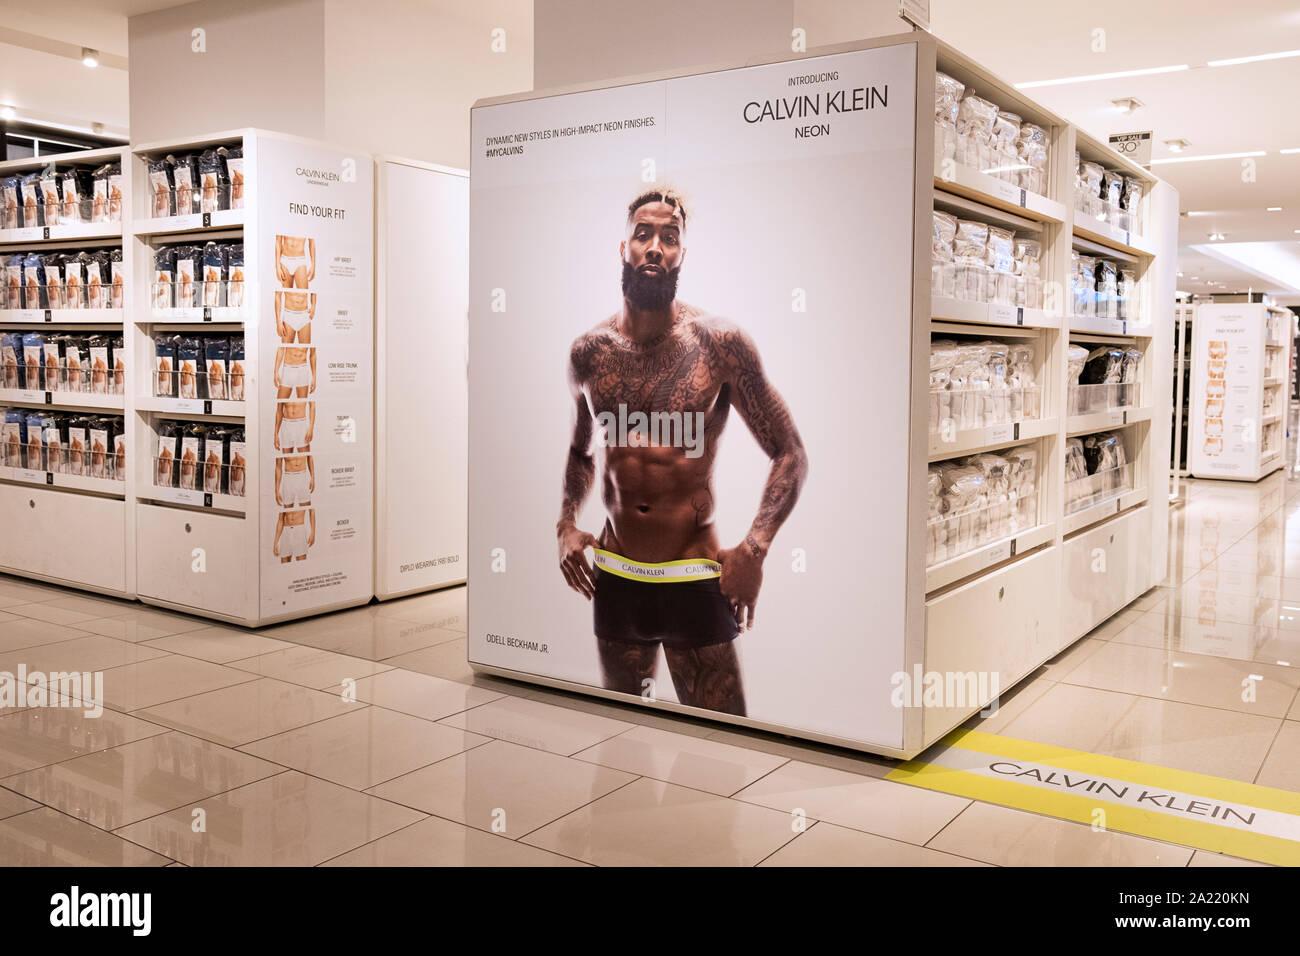 An Advertisement For Calvin Klein Men S Underwear Featuring Odell Beckham Jr In Macy S Herald Square In Manhattan New York City Stock Photo Alamy